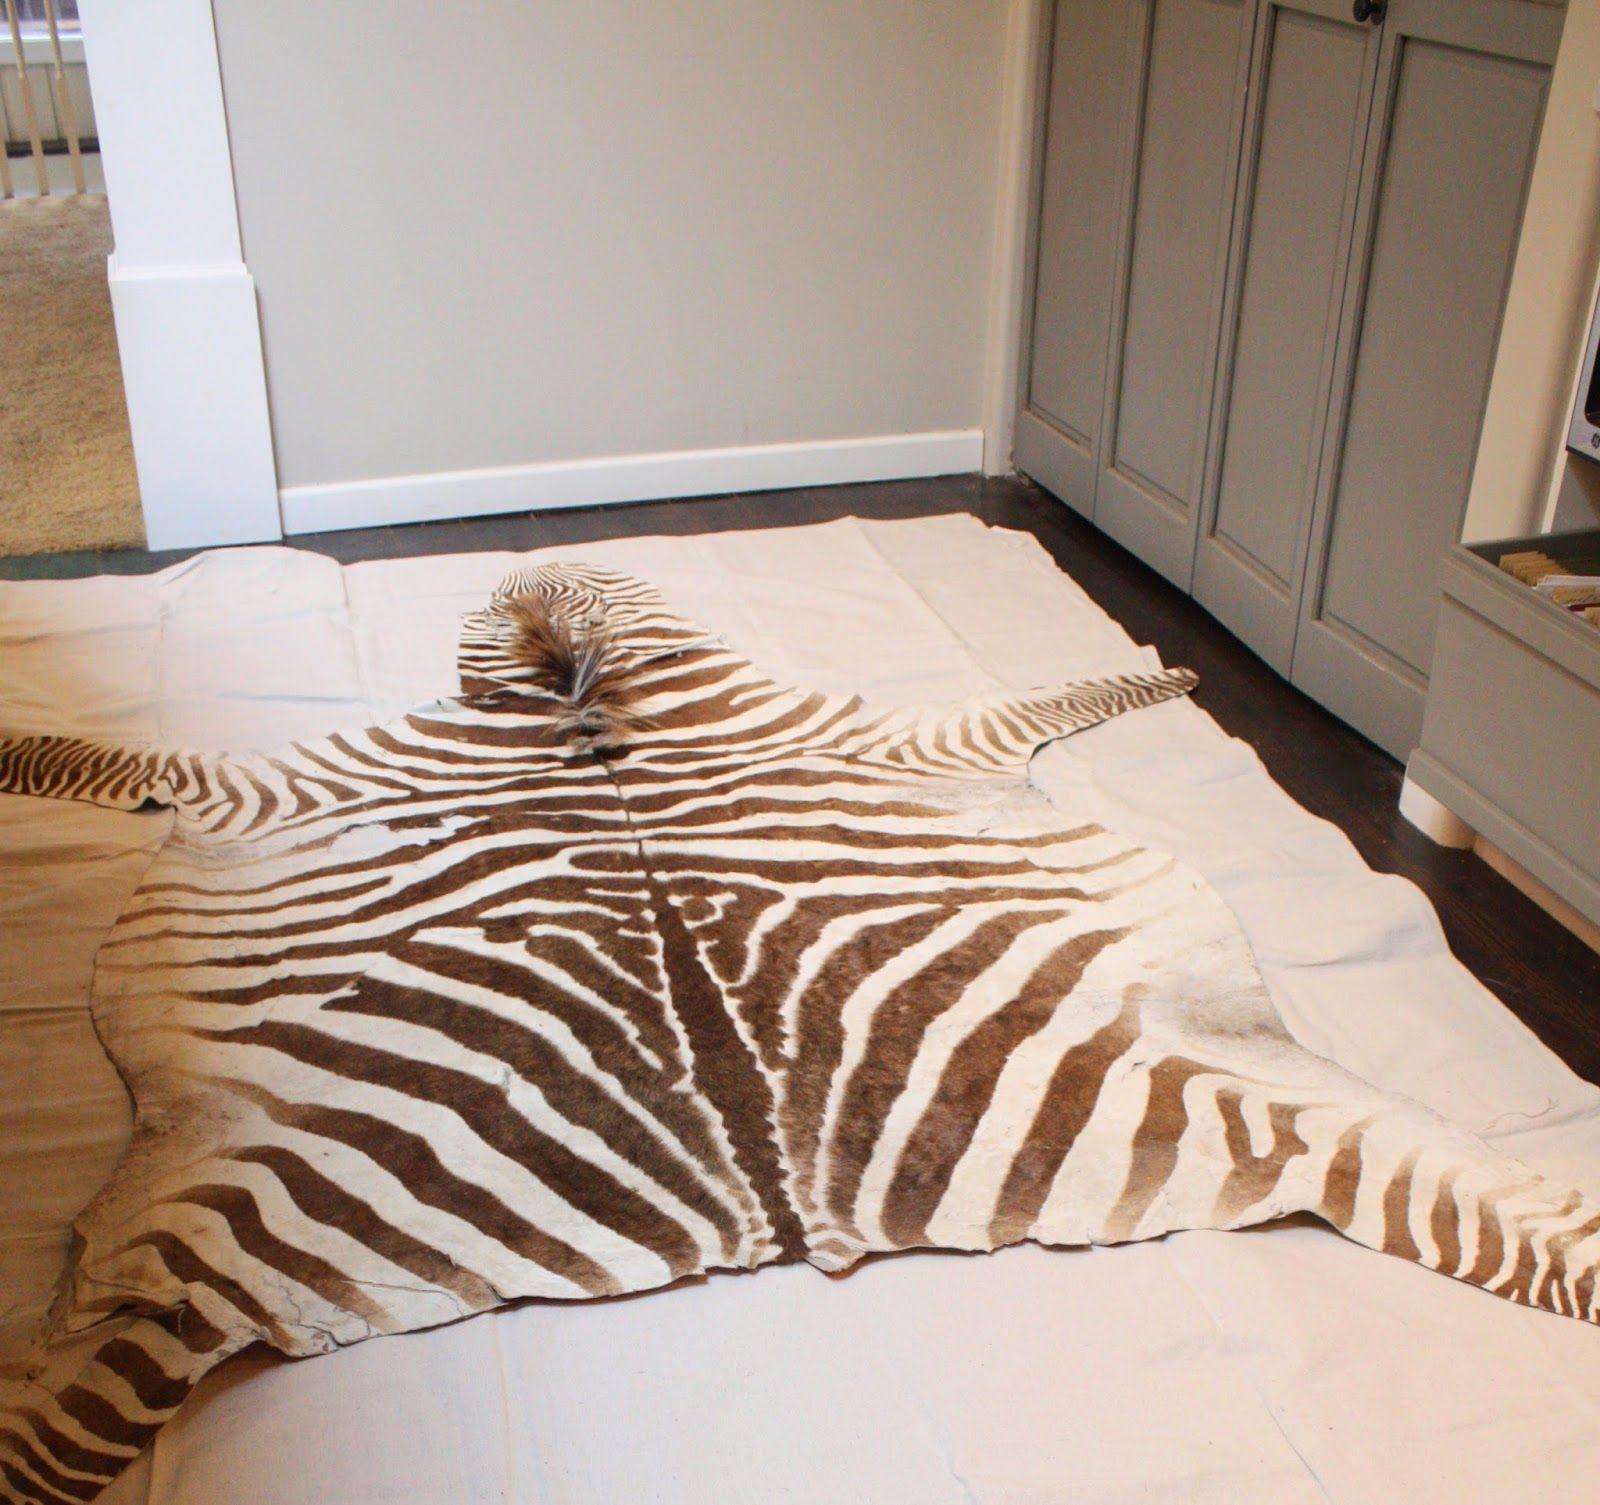 15 DIY faux zebra rug~{thrifty thursday} | Faux zebra rug, Zebra ...